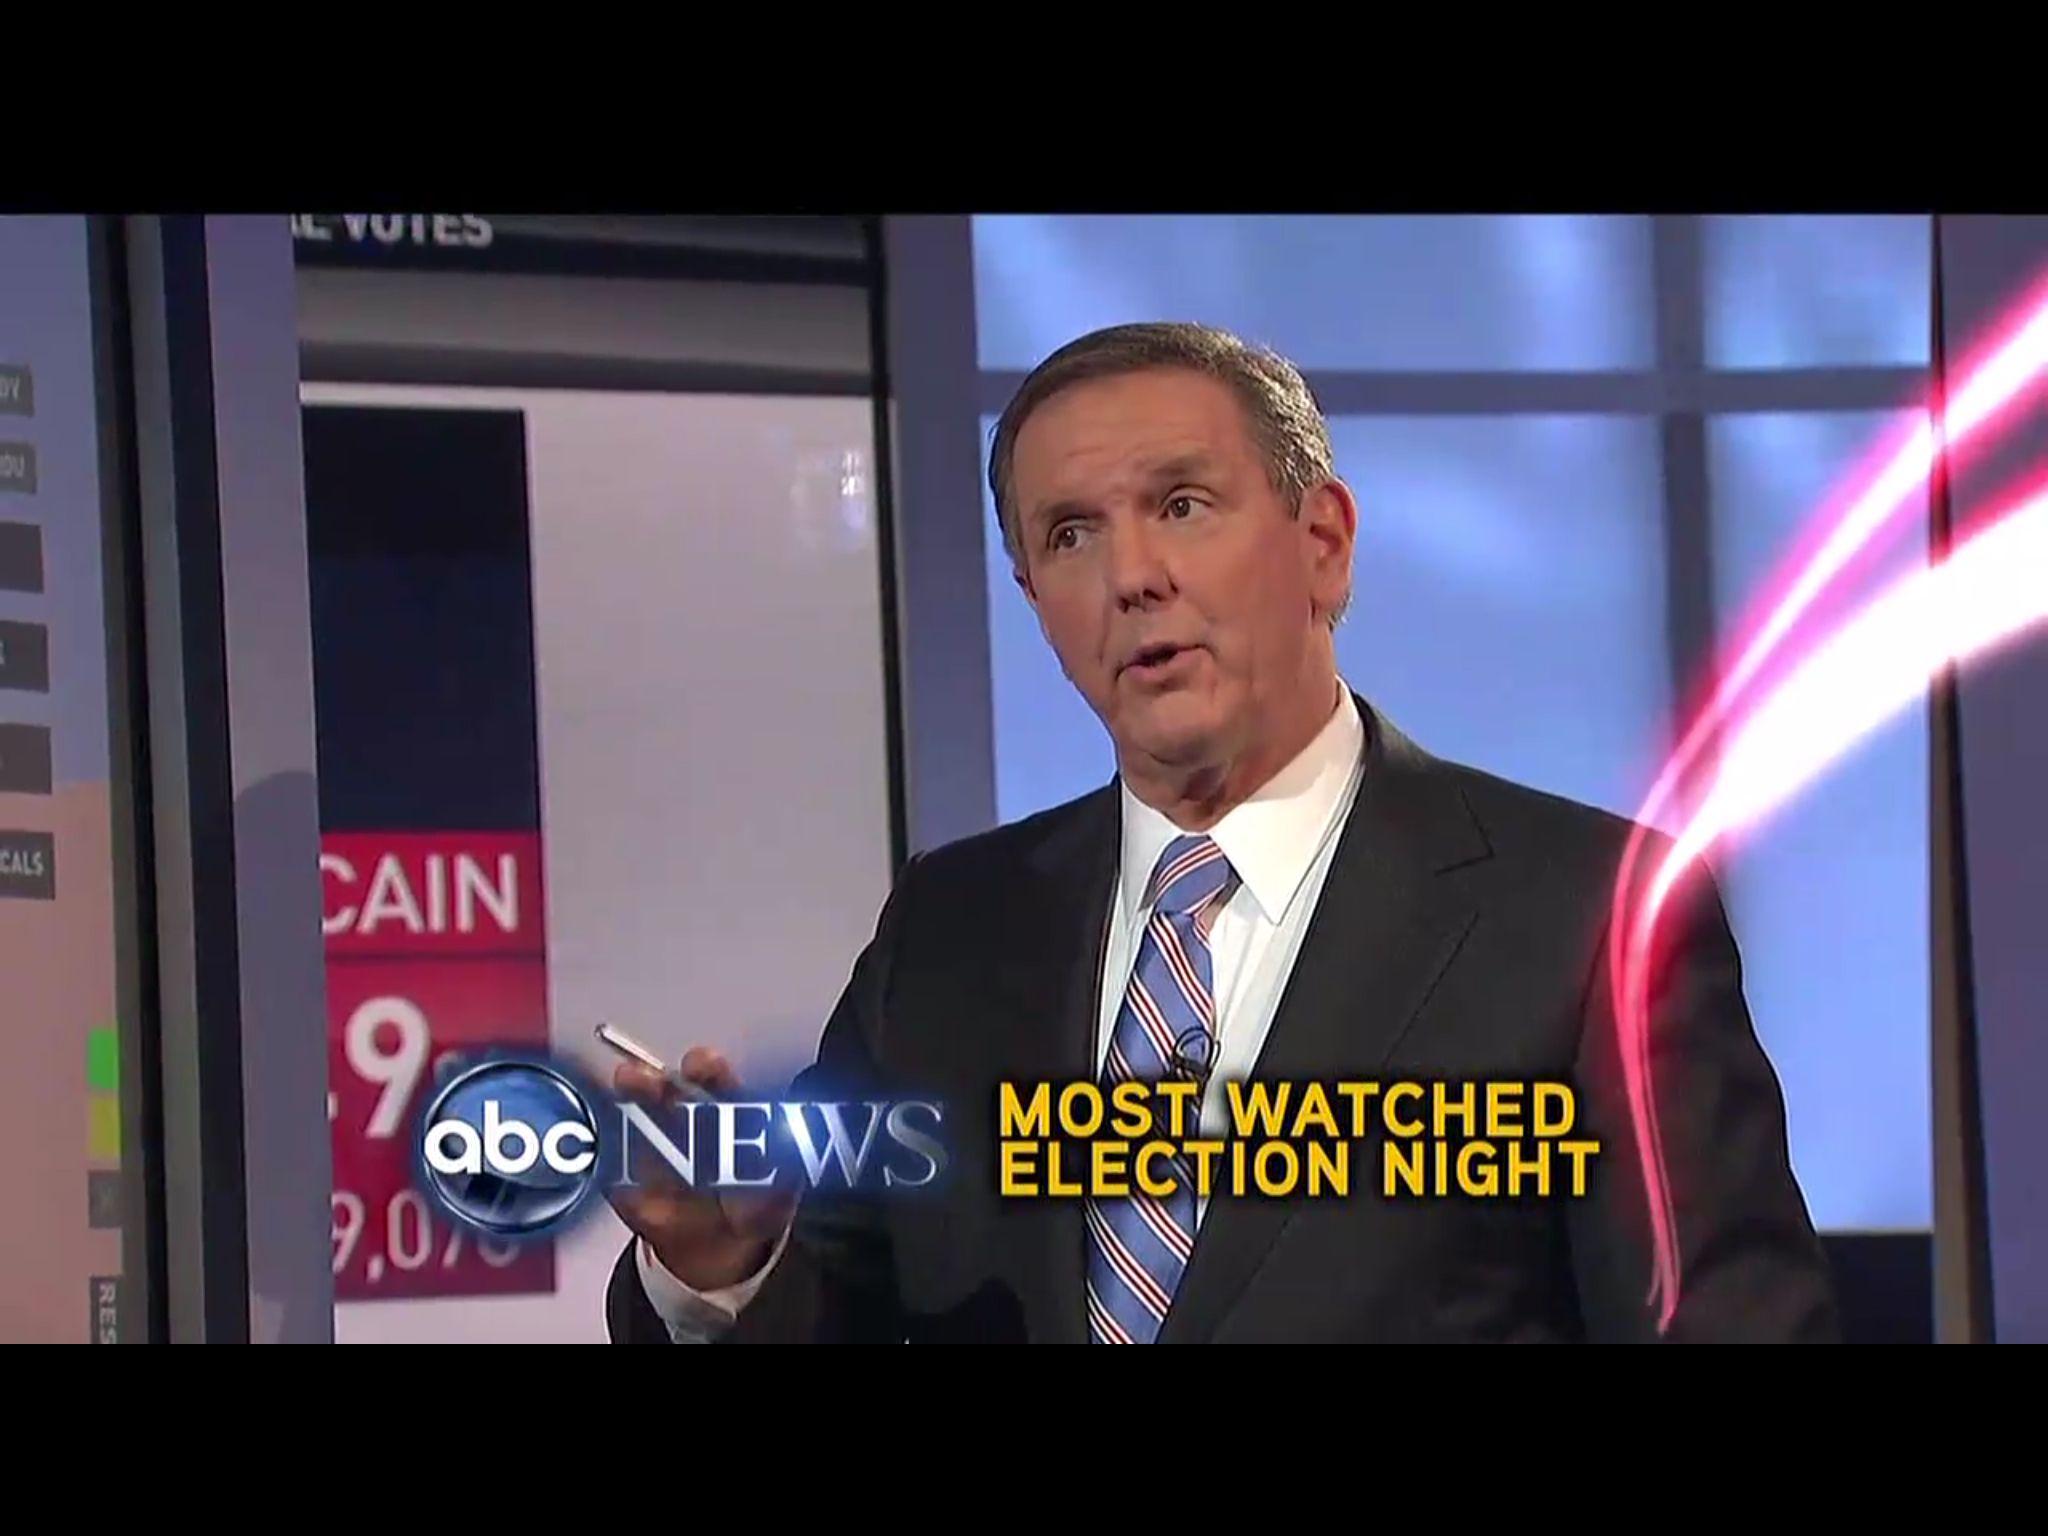 2008 ABC News promo